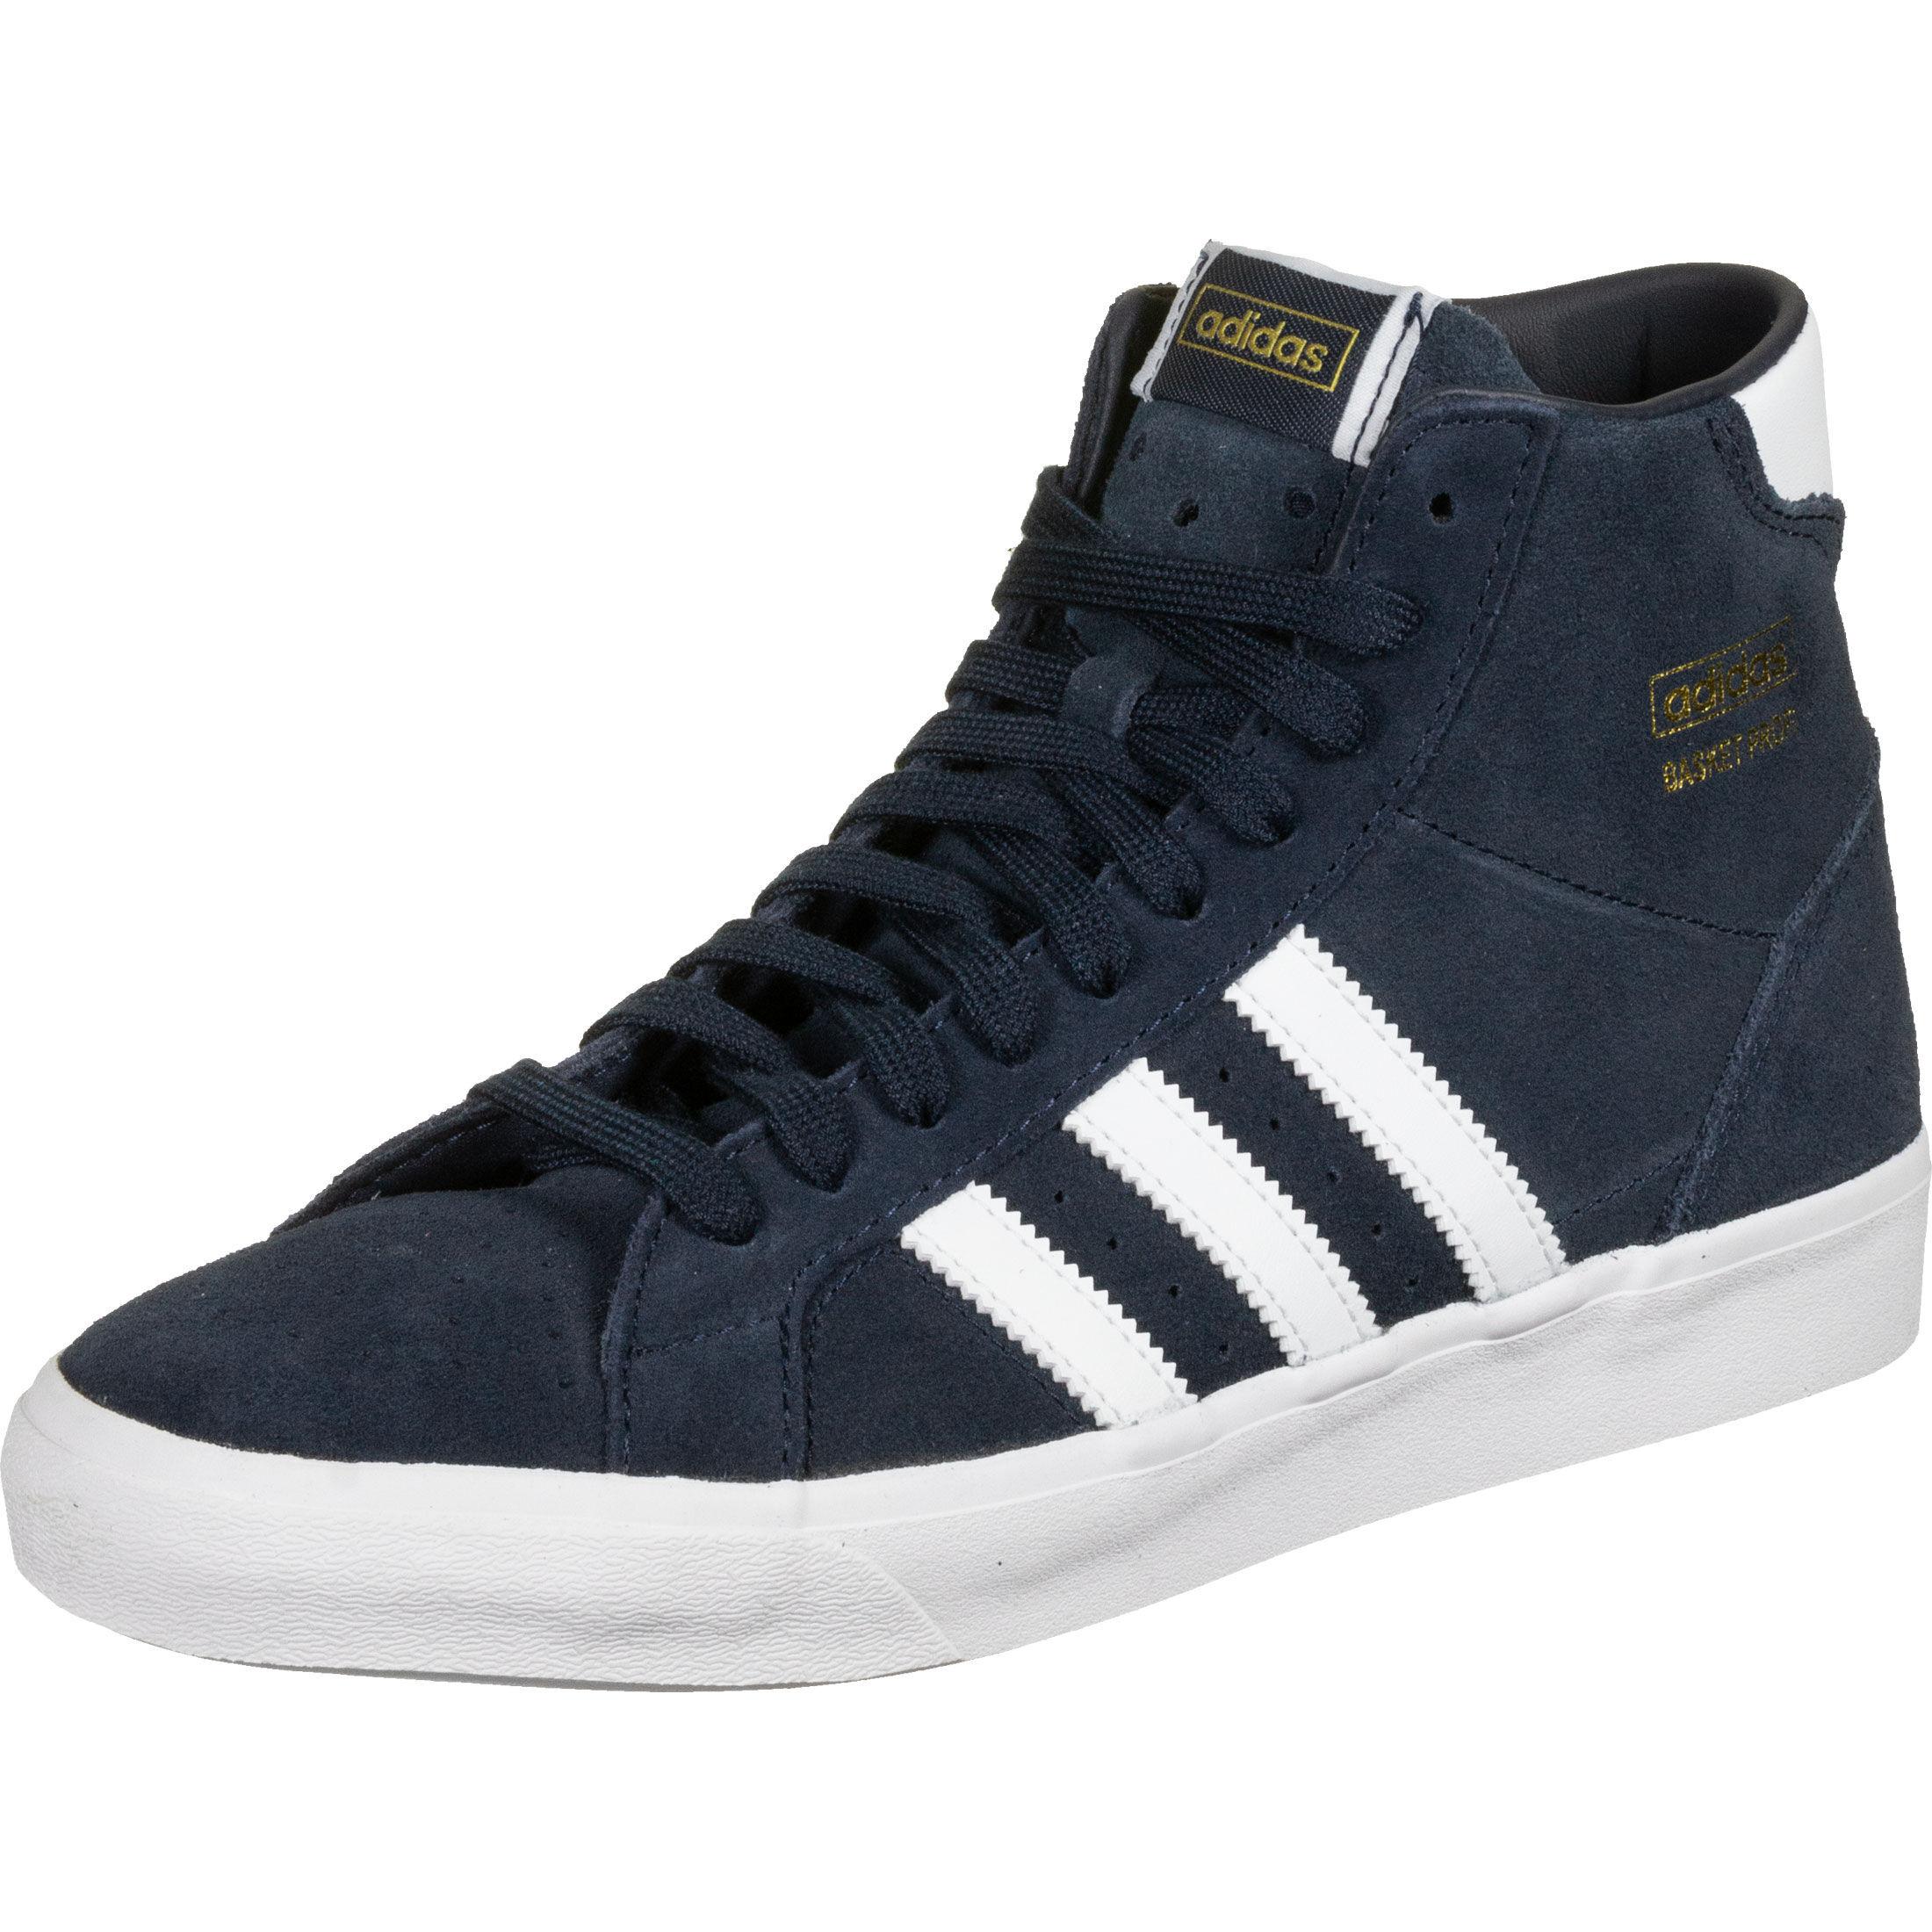 adidas BASKET PROFI, 39 1/3 EU, bleu